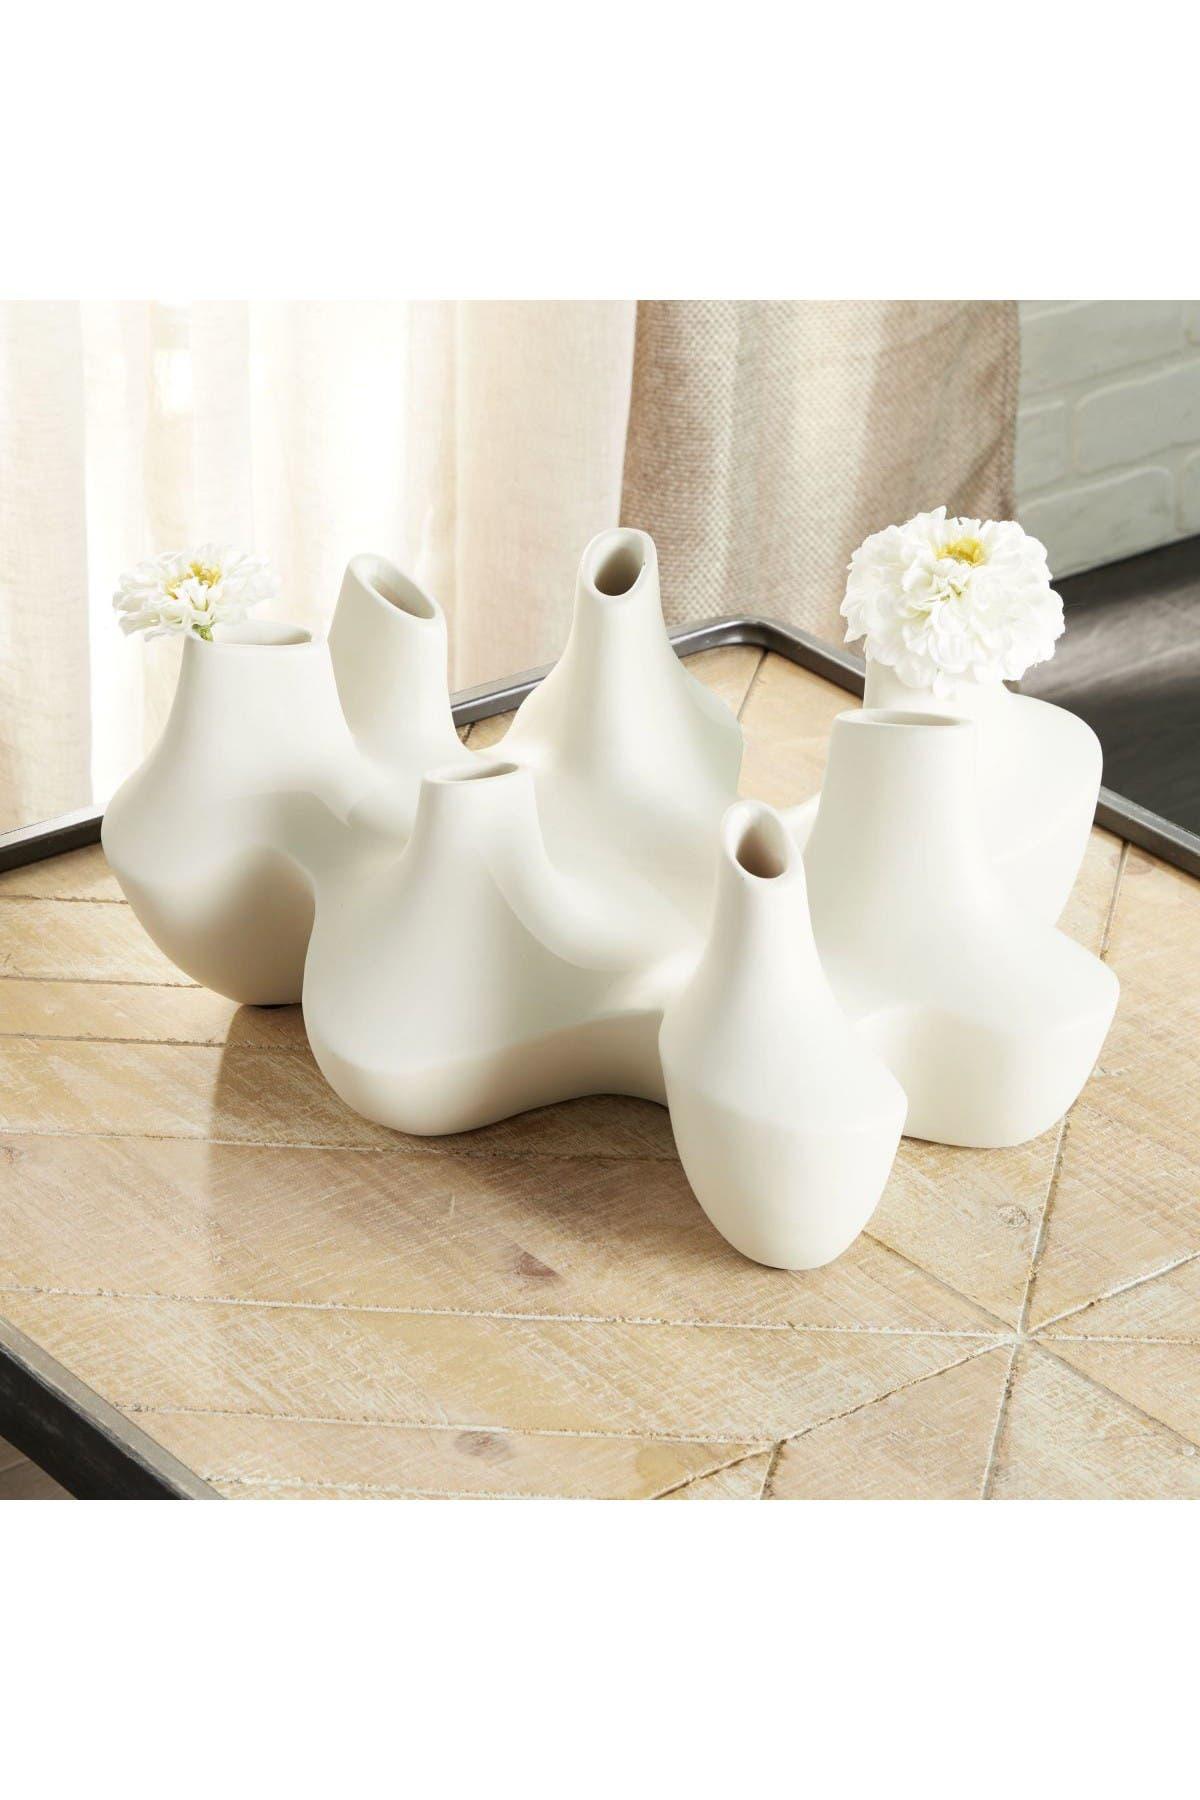 Image of Willow Row Large Modern White Ceramic 7-Vase Cluster